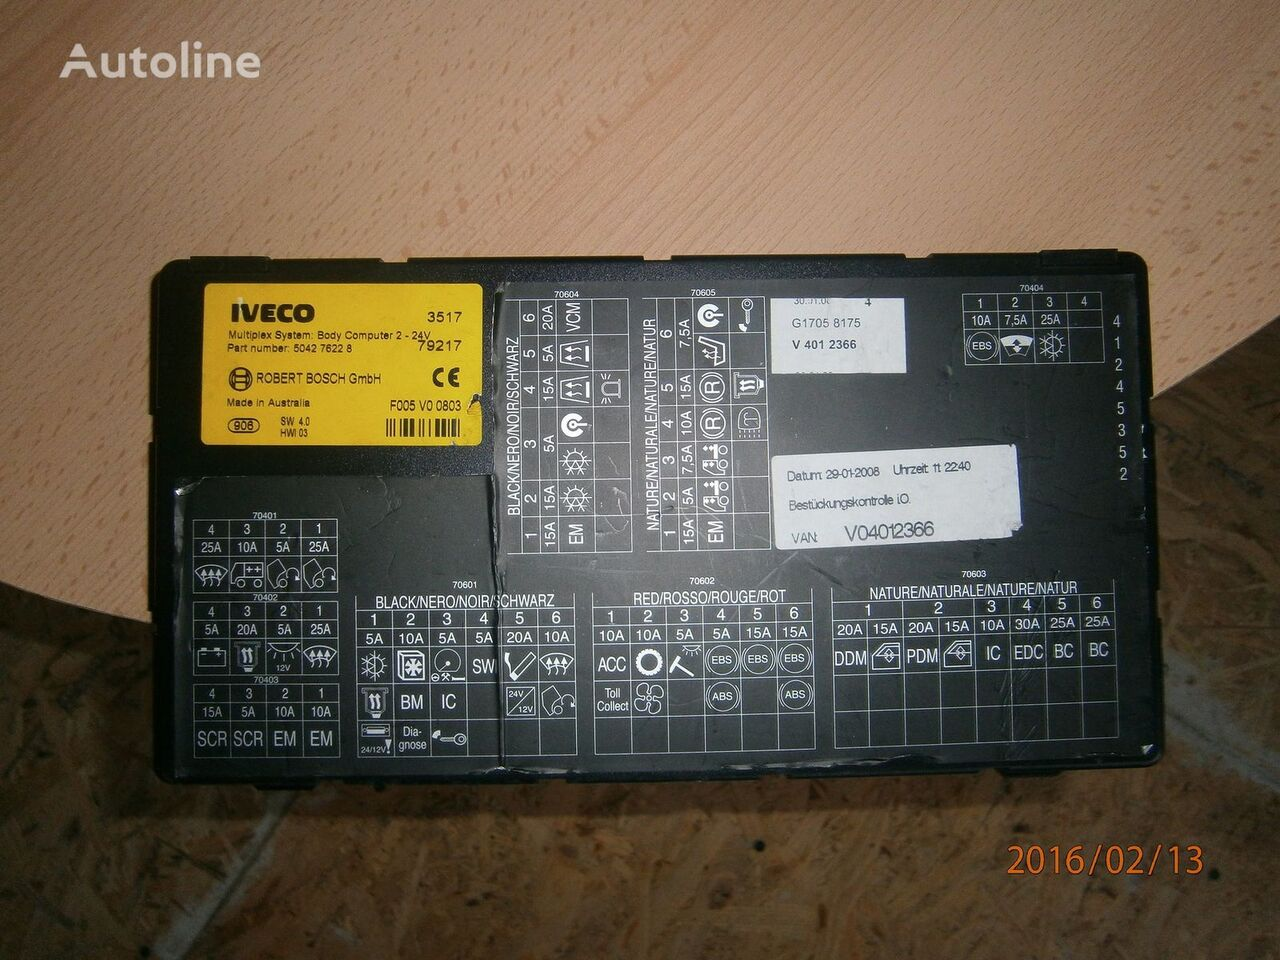 блок за управление  Iveco Stralis EURO5 Multiplex system body computer 504276228 за влекач IVECO Stralis